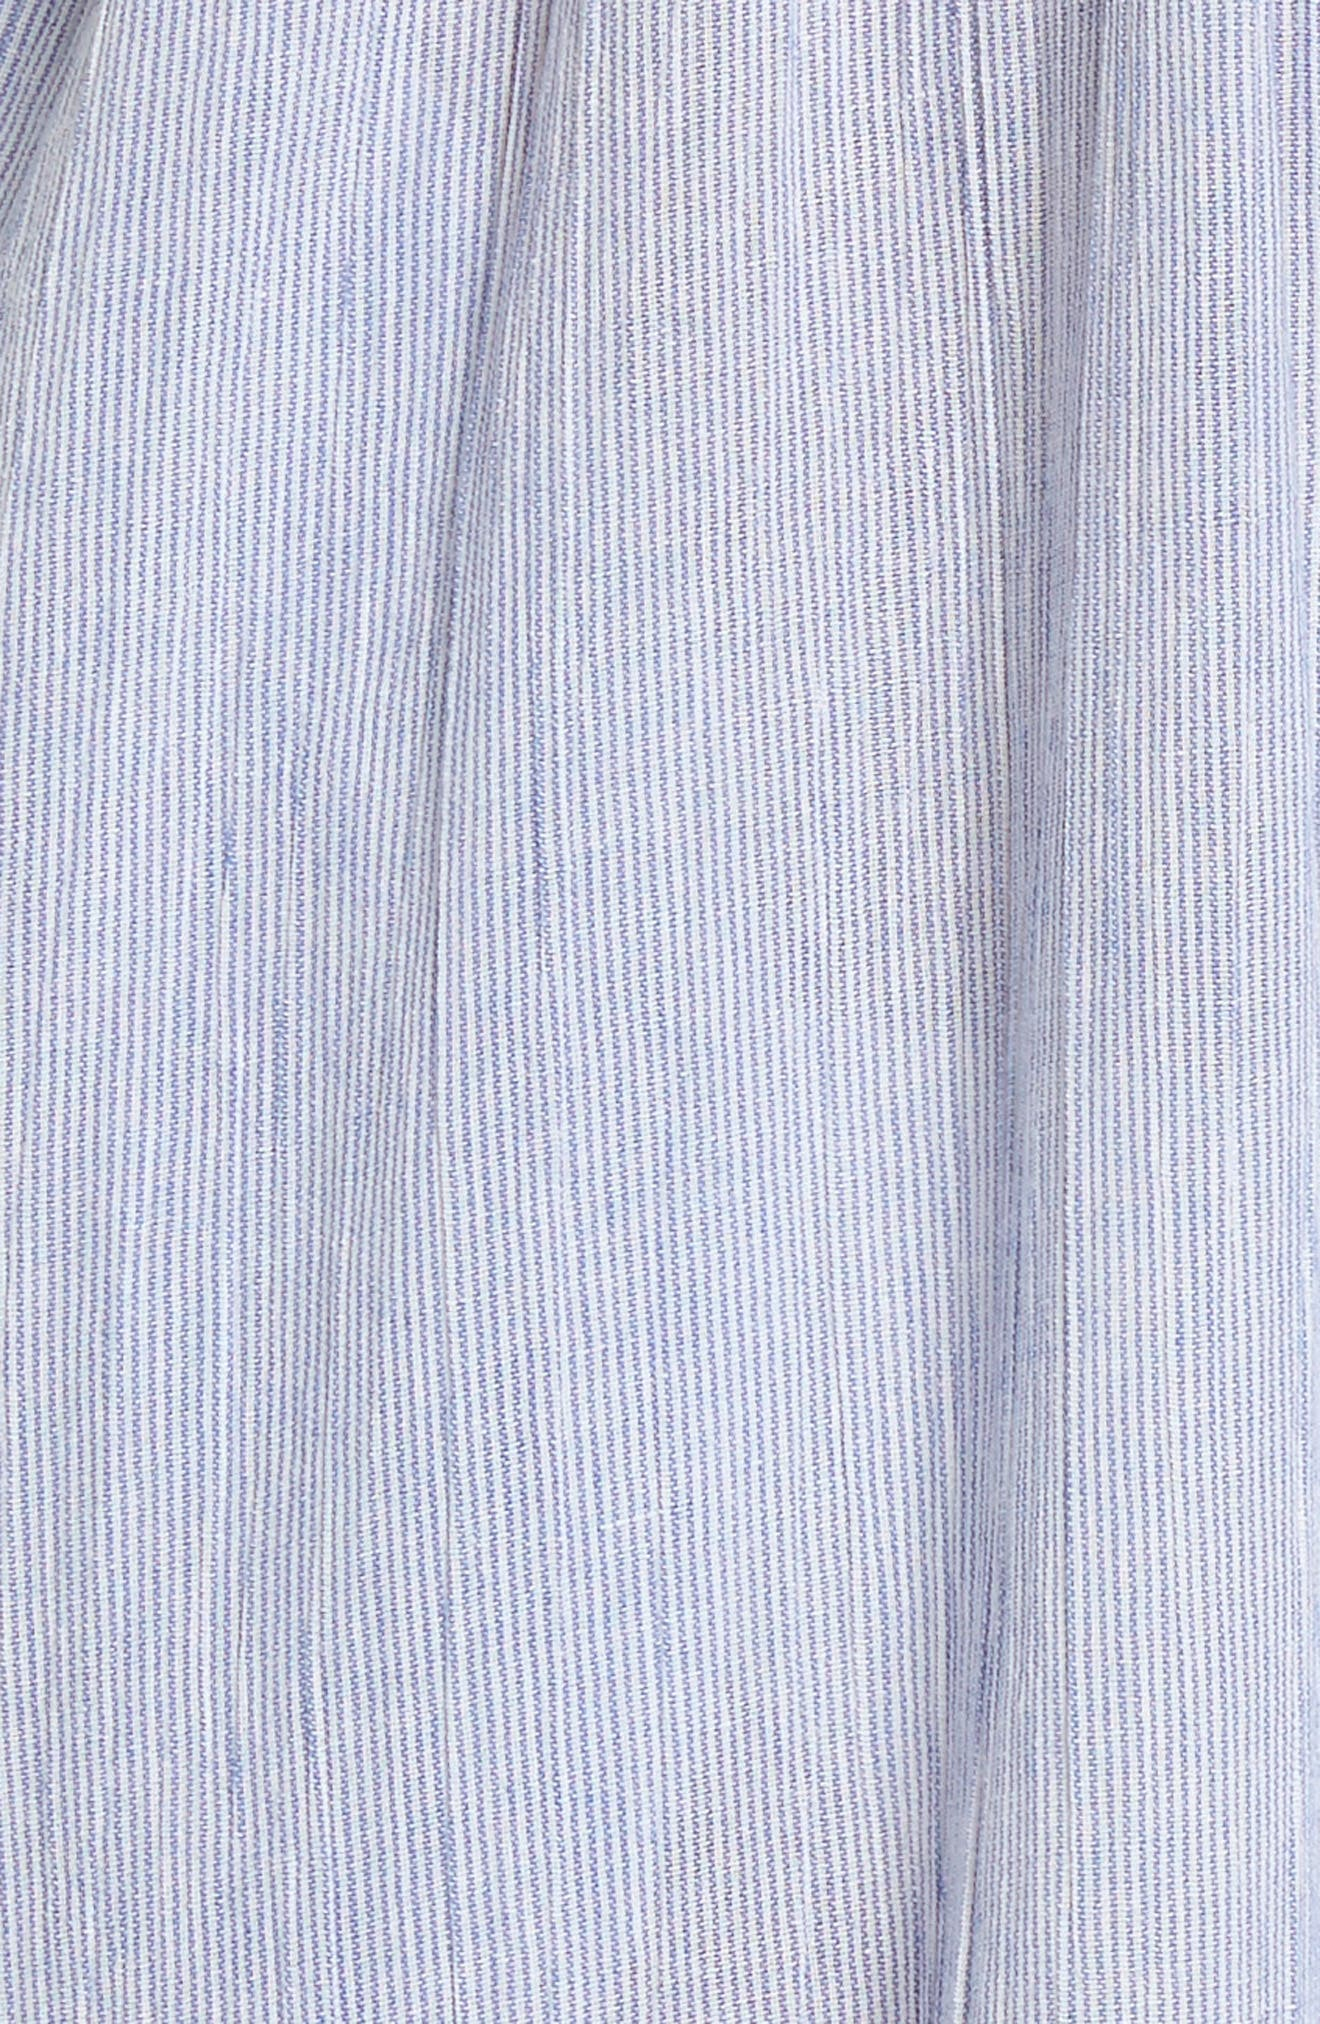 Florentina Jumpsuit Cover-Up,                             Alternate thumbnail 5, color,                             Blue/ White